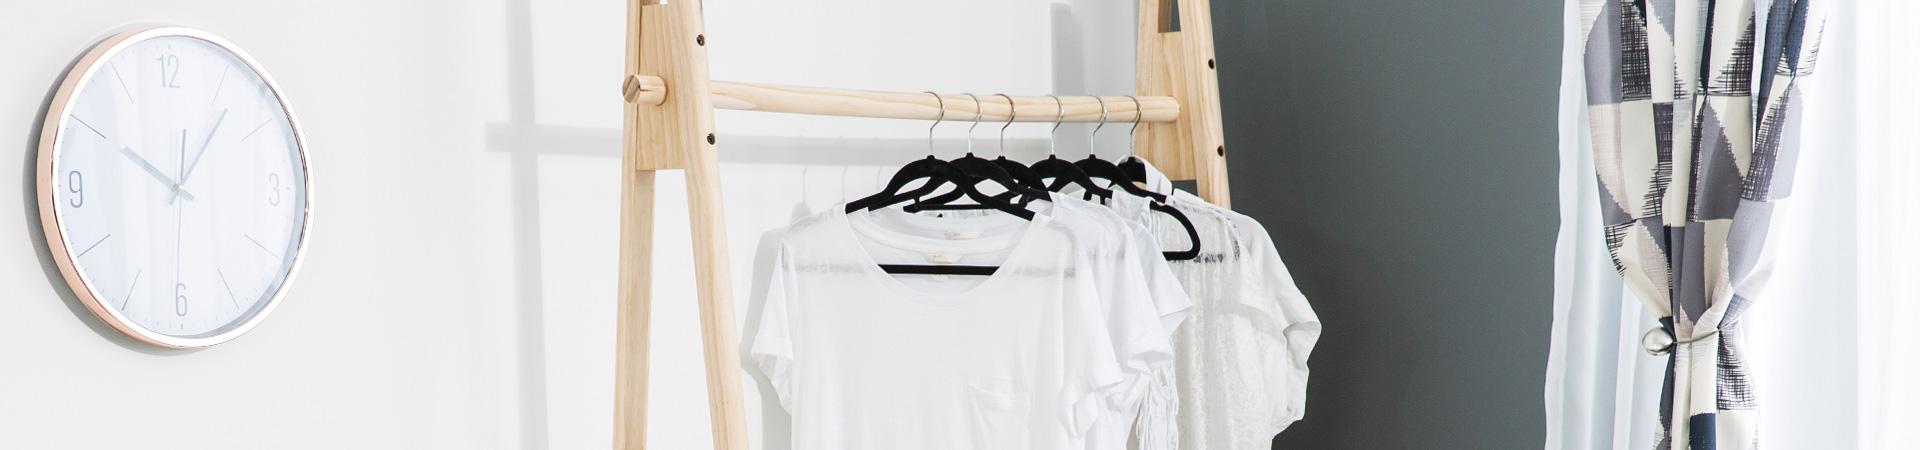 Drēbju pakaramie